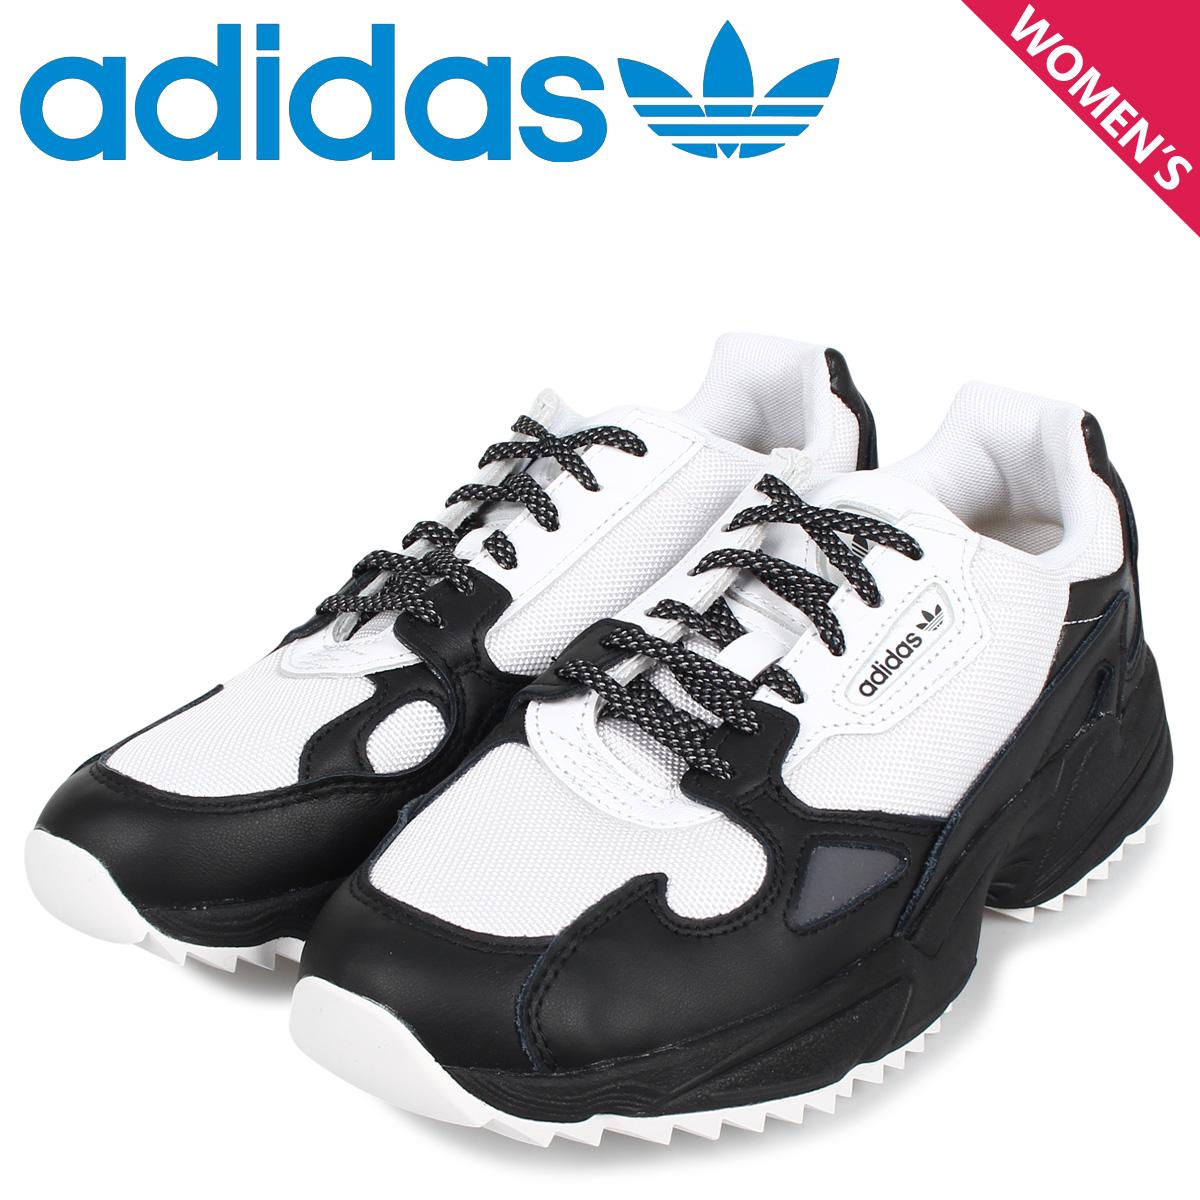 adidas Originals アディダス オリジナルス アディダスファルコン トレイル スニーカー レディース ADIDASFALCON TRAIL W ホワイト 白 EF9023